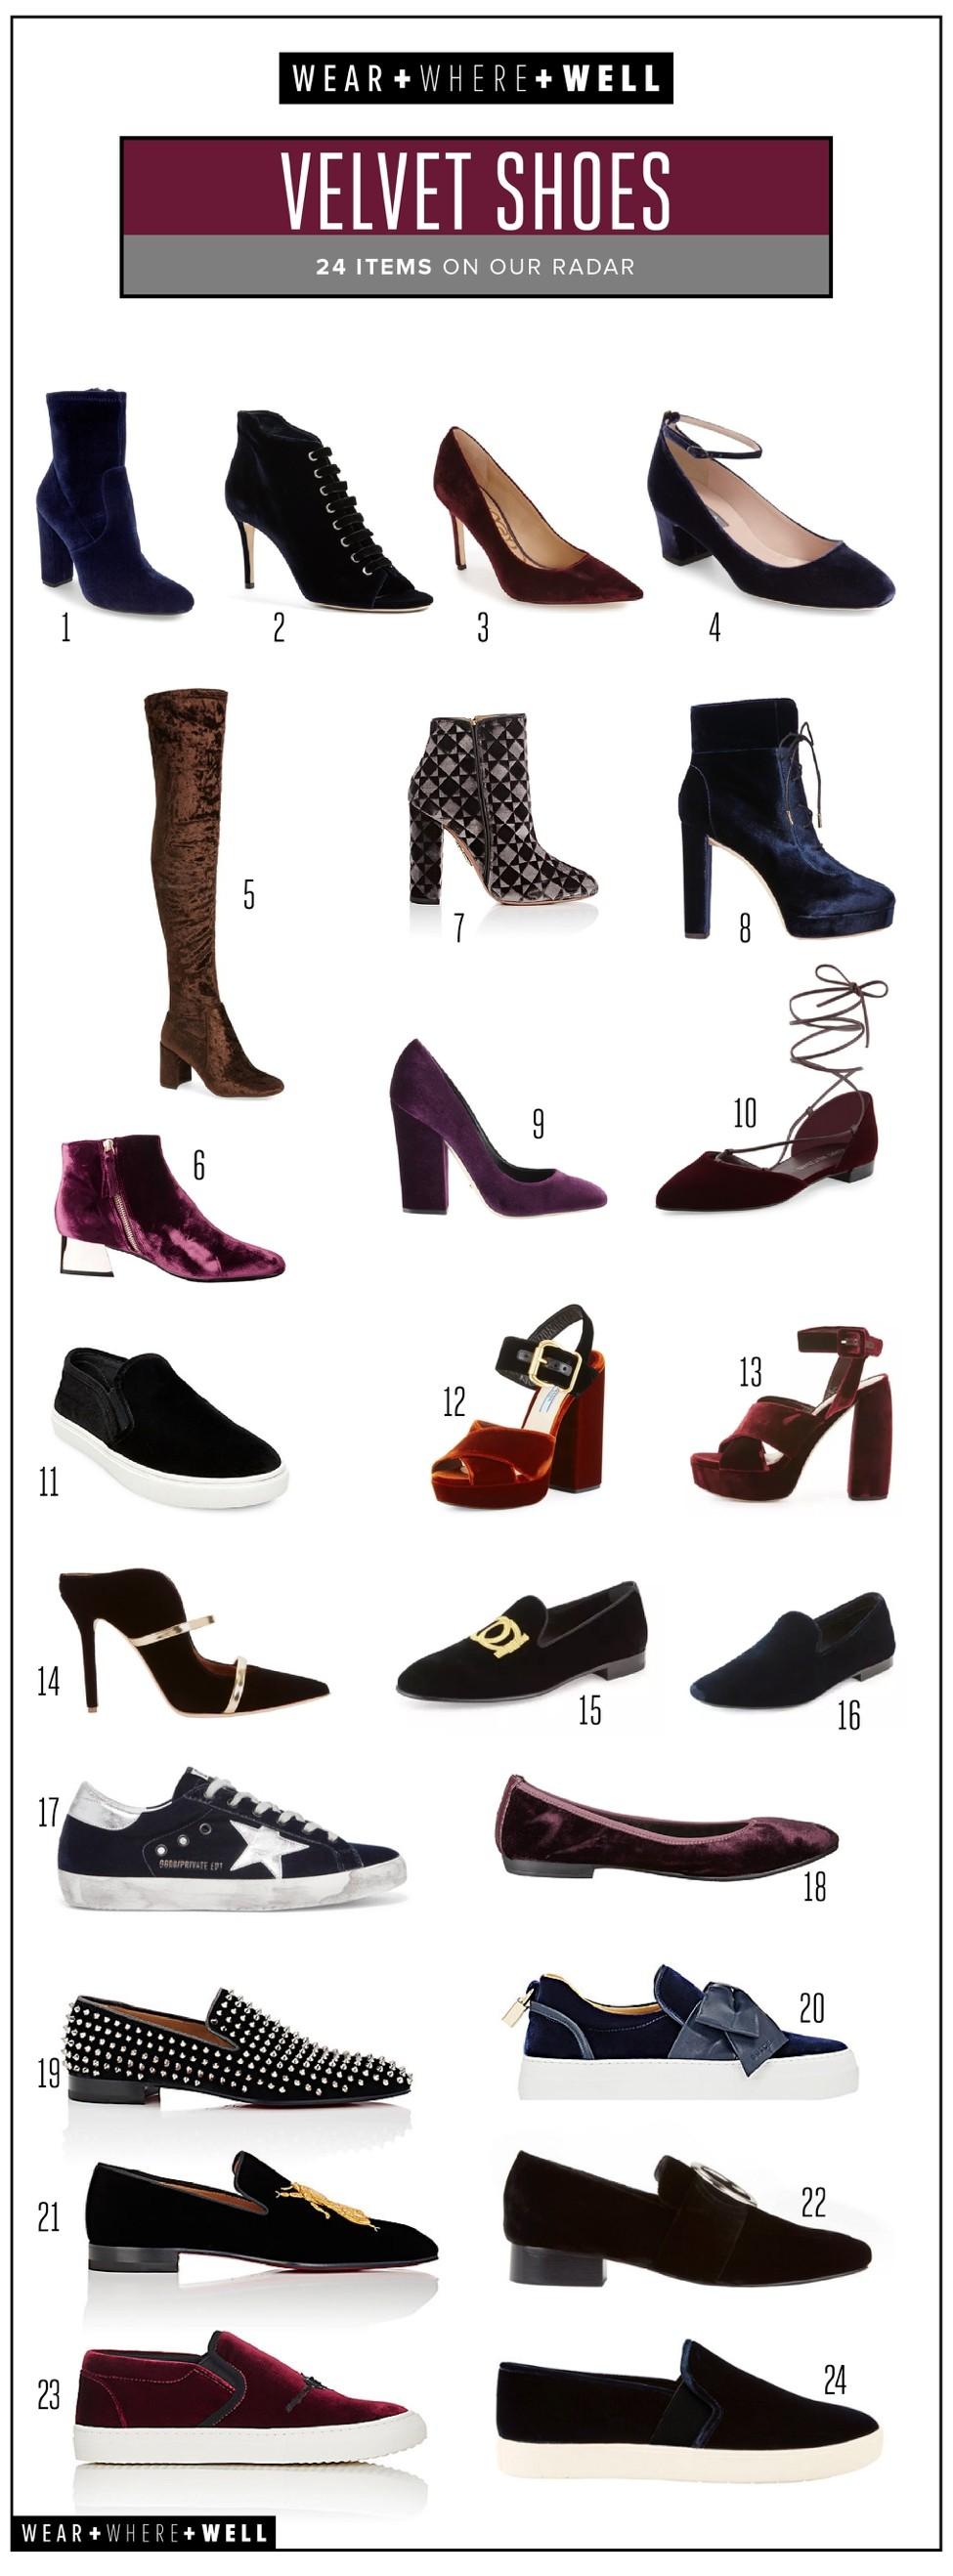 c042b0a61fec 22 Inspiring Ideas for How to Wear Velvet Shoes - Carrie Colbert